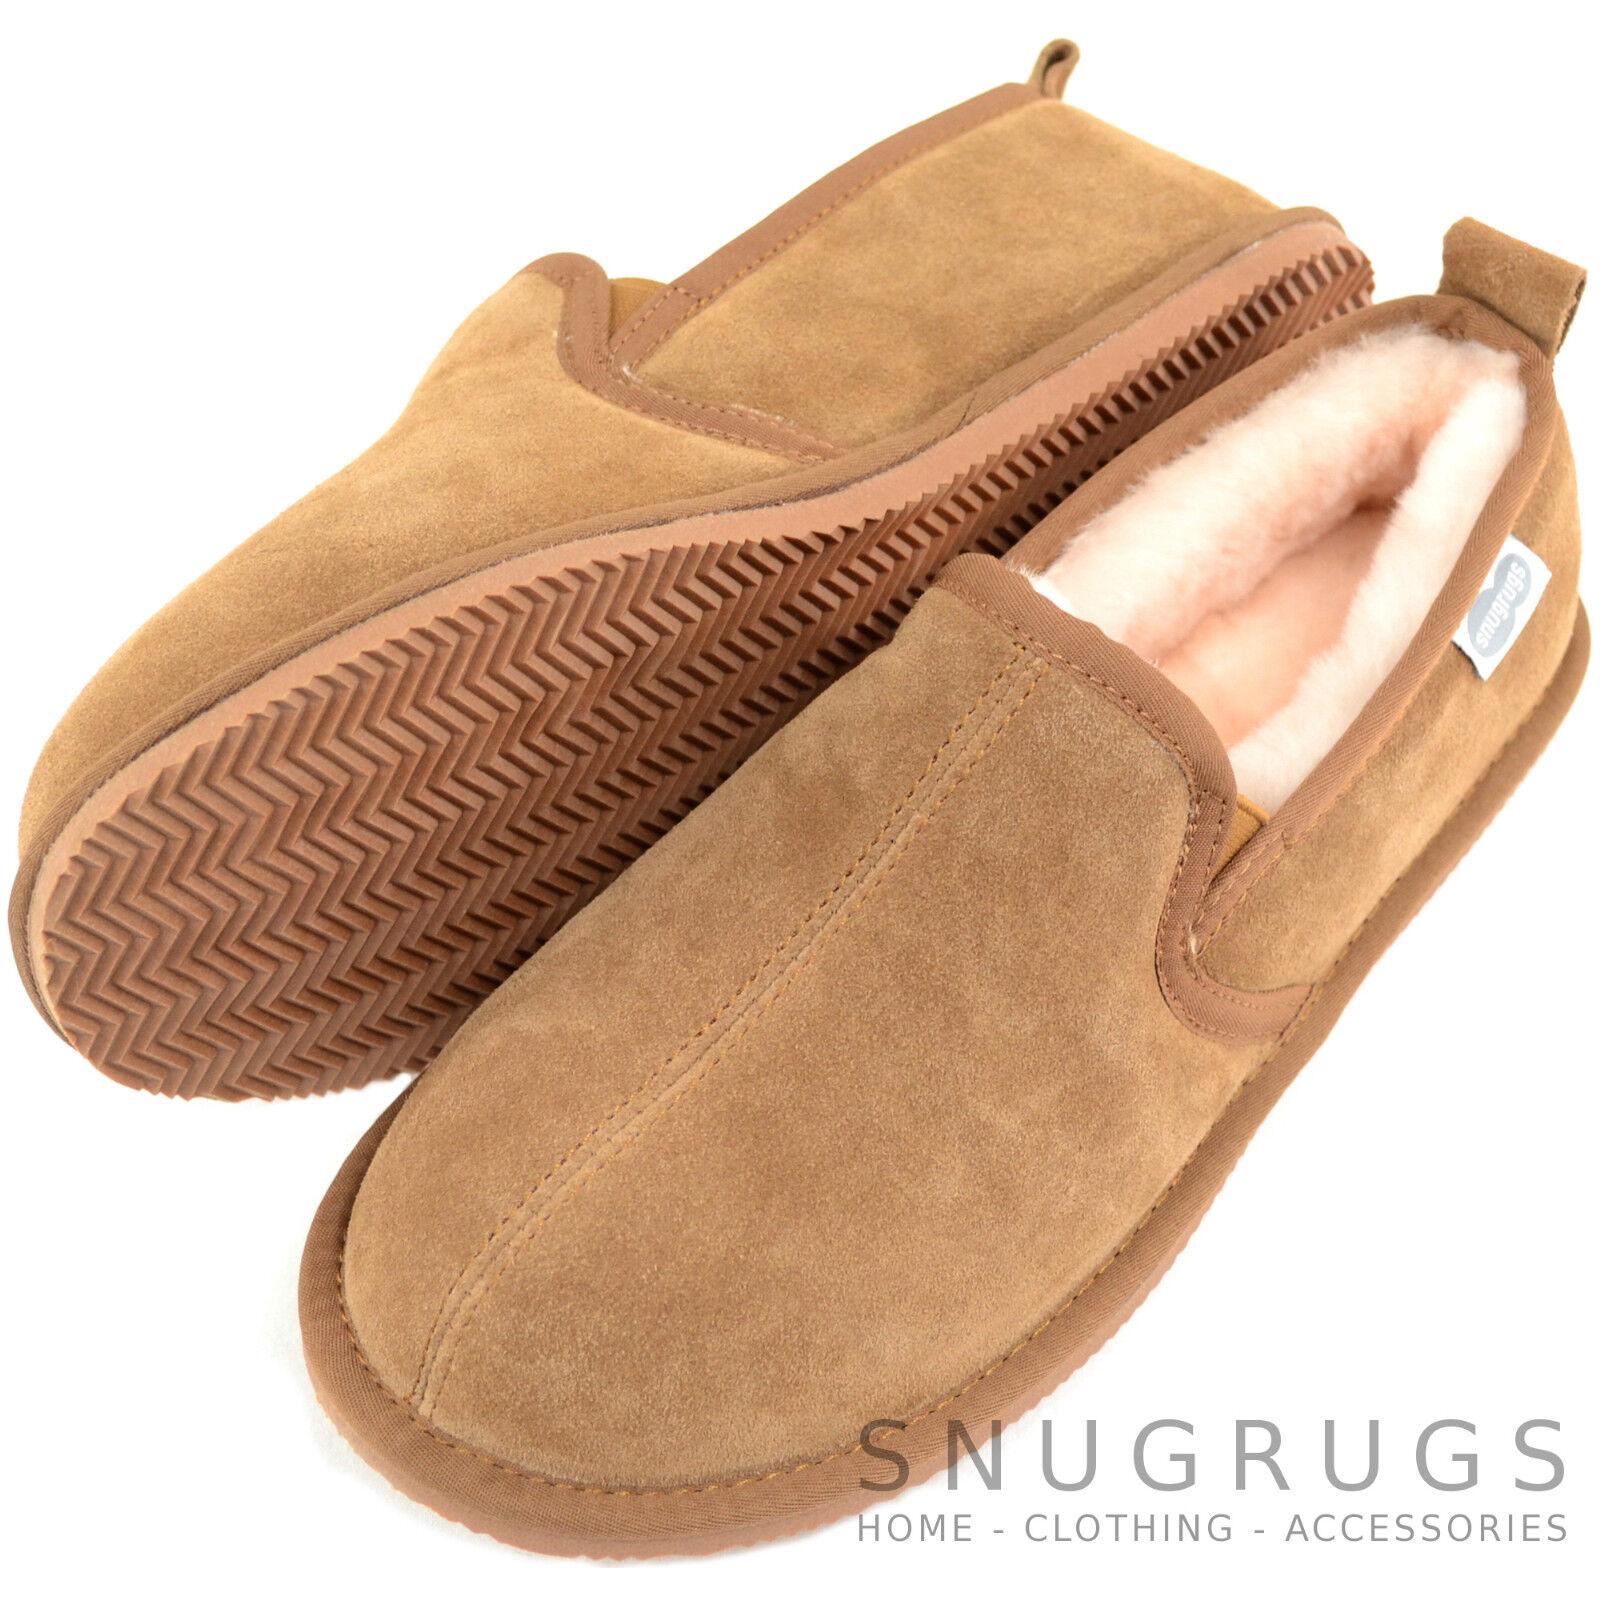 Snugrugs Herren/Herren Luxus Voll Lammfell Gummisohle Pantoffel Stiefel mit Gummisohle Lammfell 880cf2